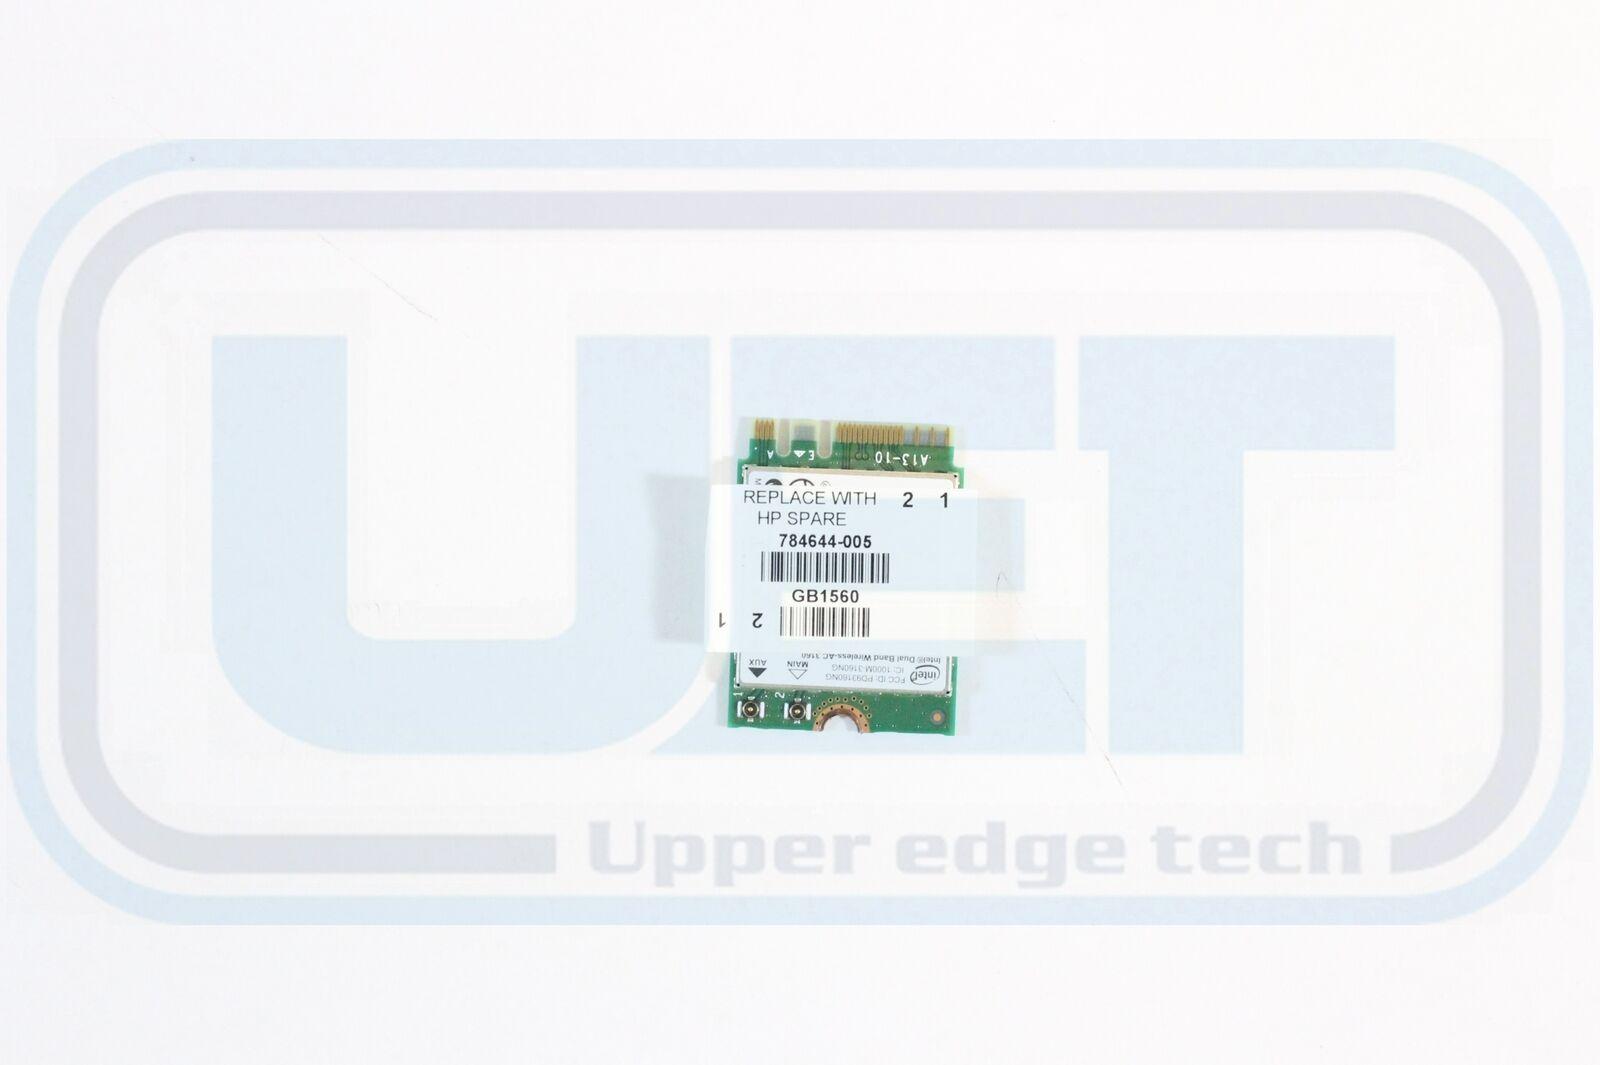 HP Pavilion 13-S020NR 784644-005 802.11ac M.2 Tested Warranty